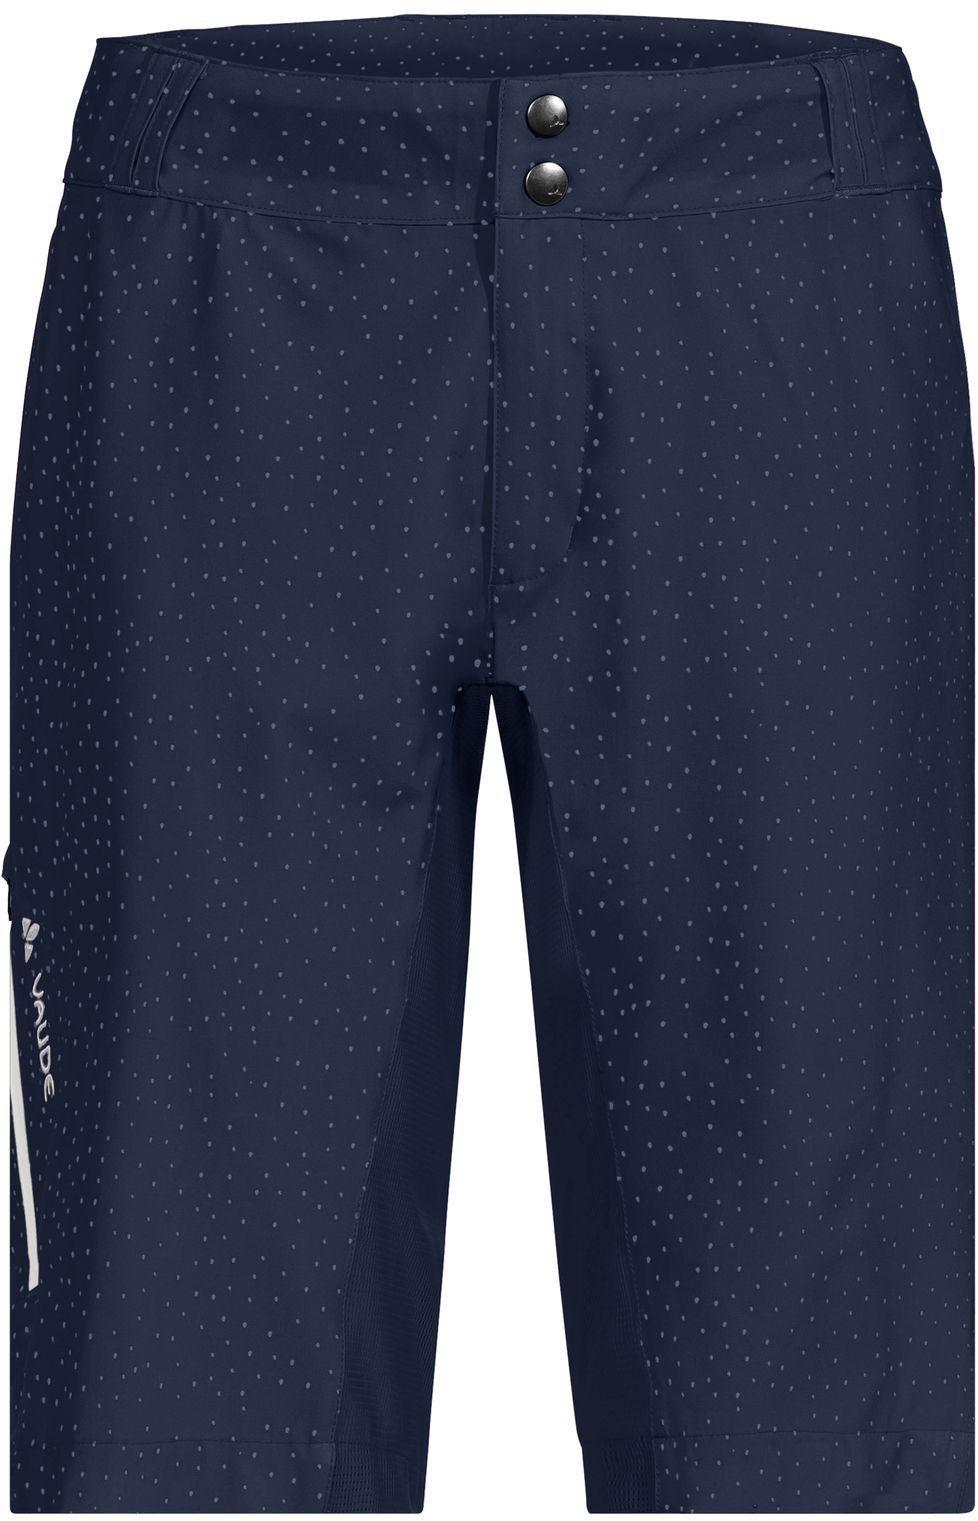 Vaude Women's Ligure Shorts - eclipse/eclipse XS